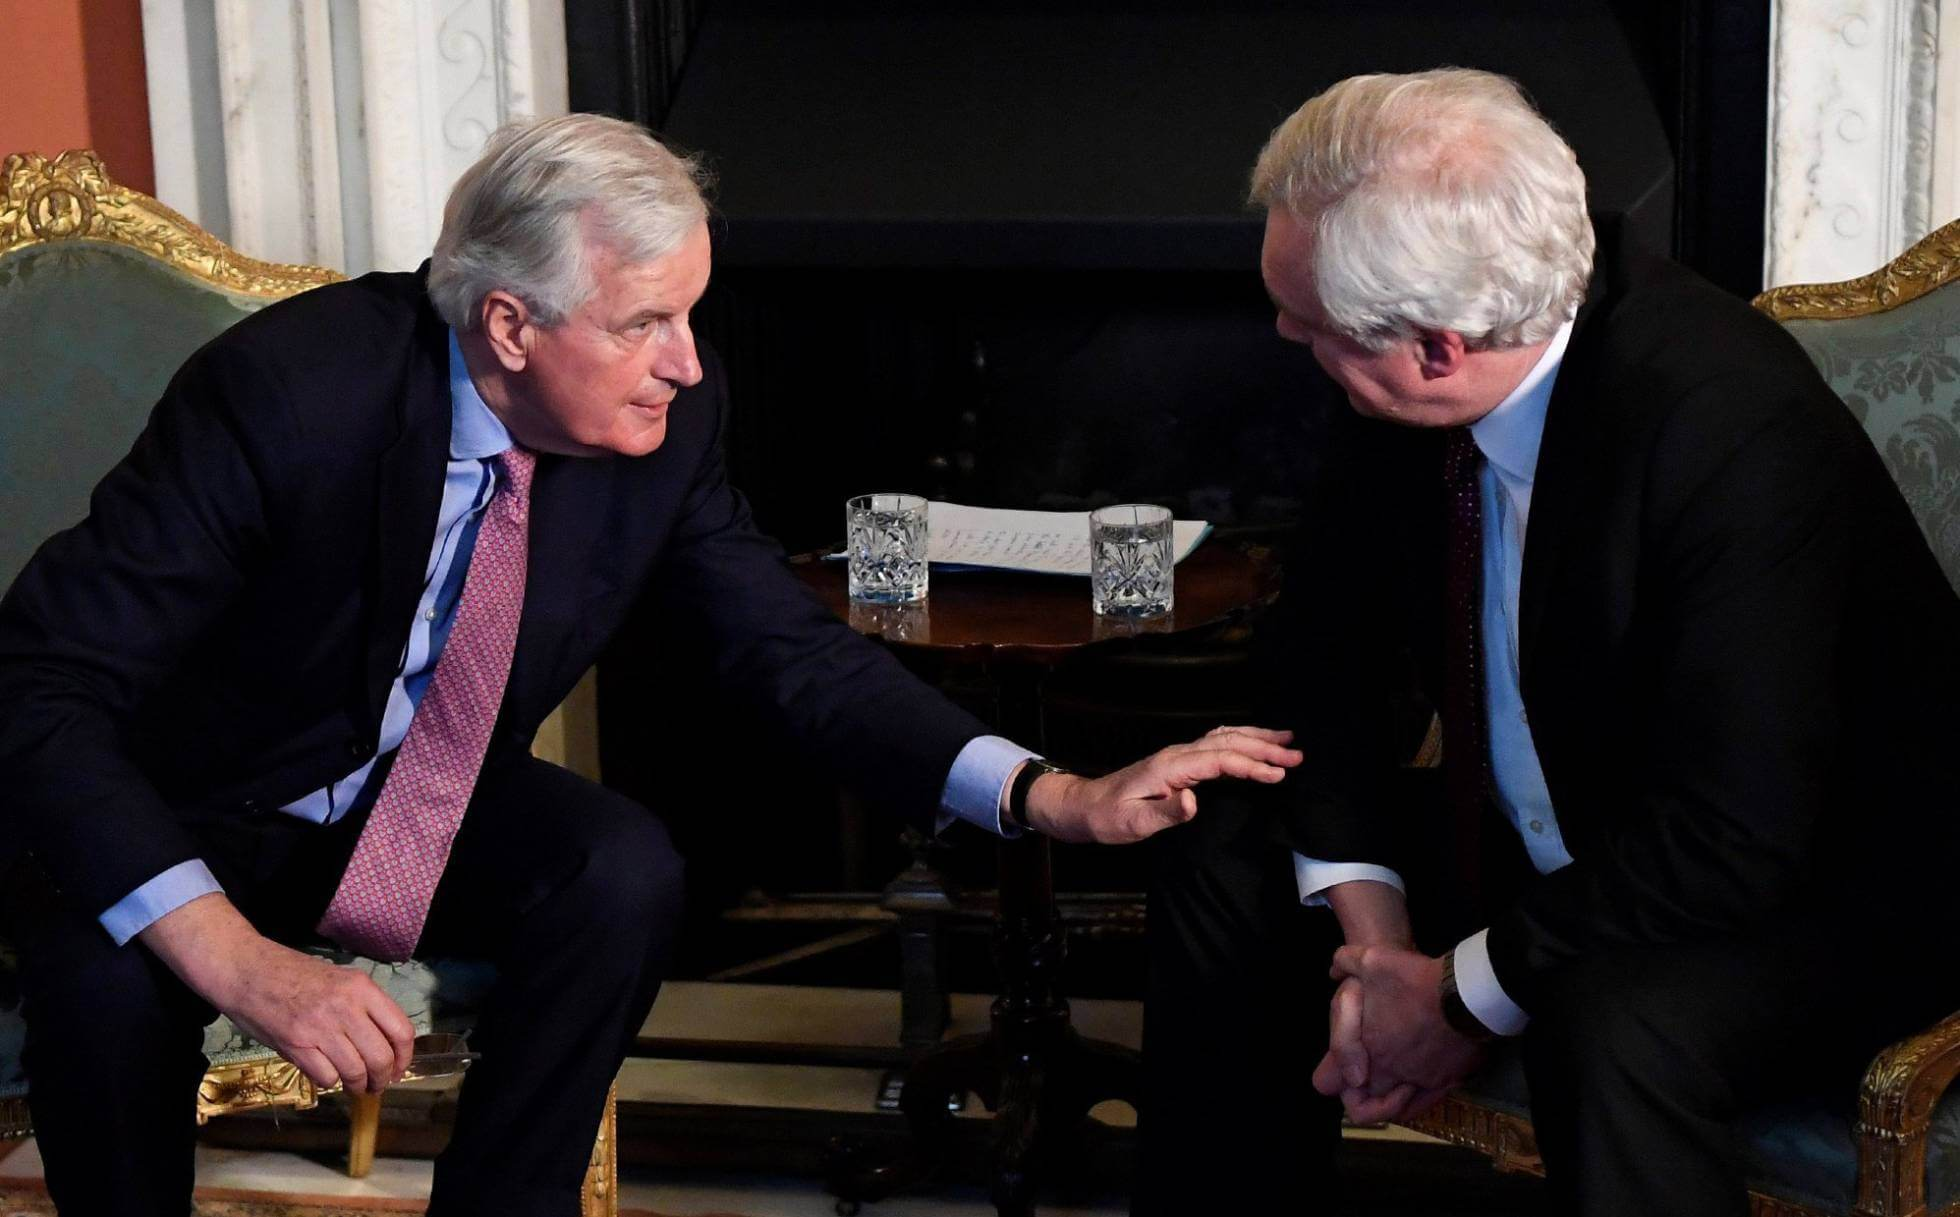 Michel Barnier (izquierda) y David Davis, en Downing Street. NEIL HALL EFE